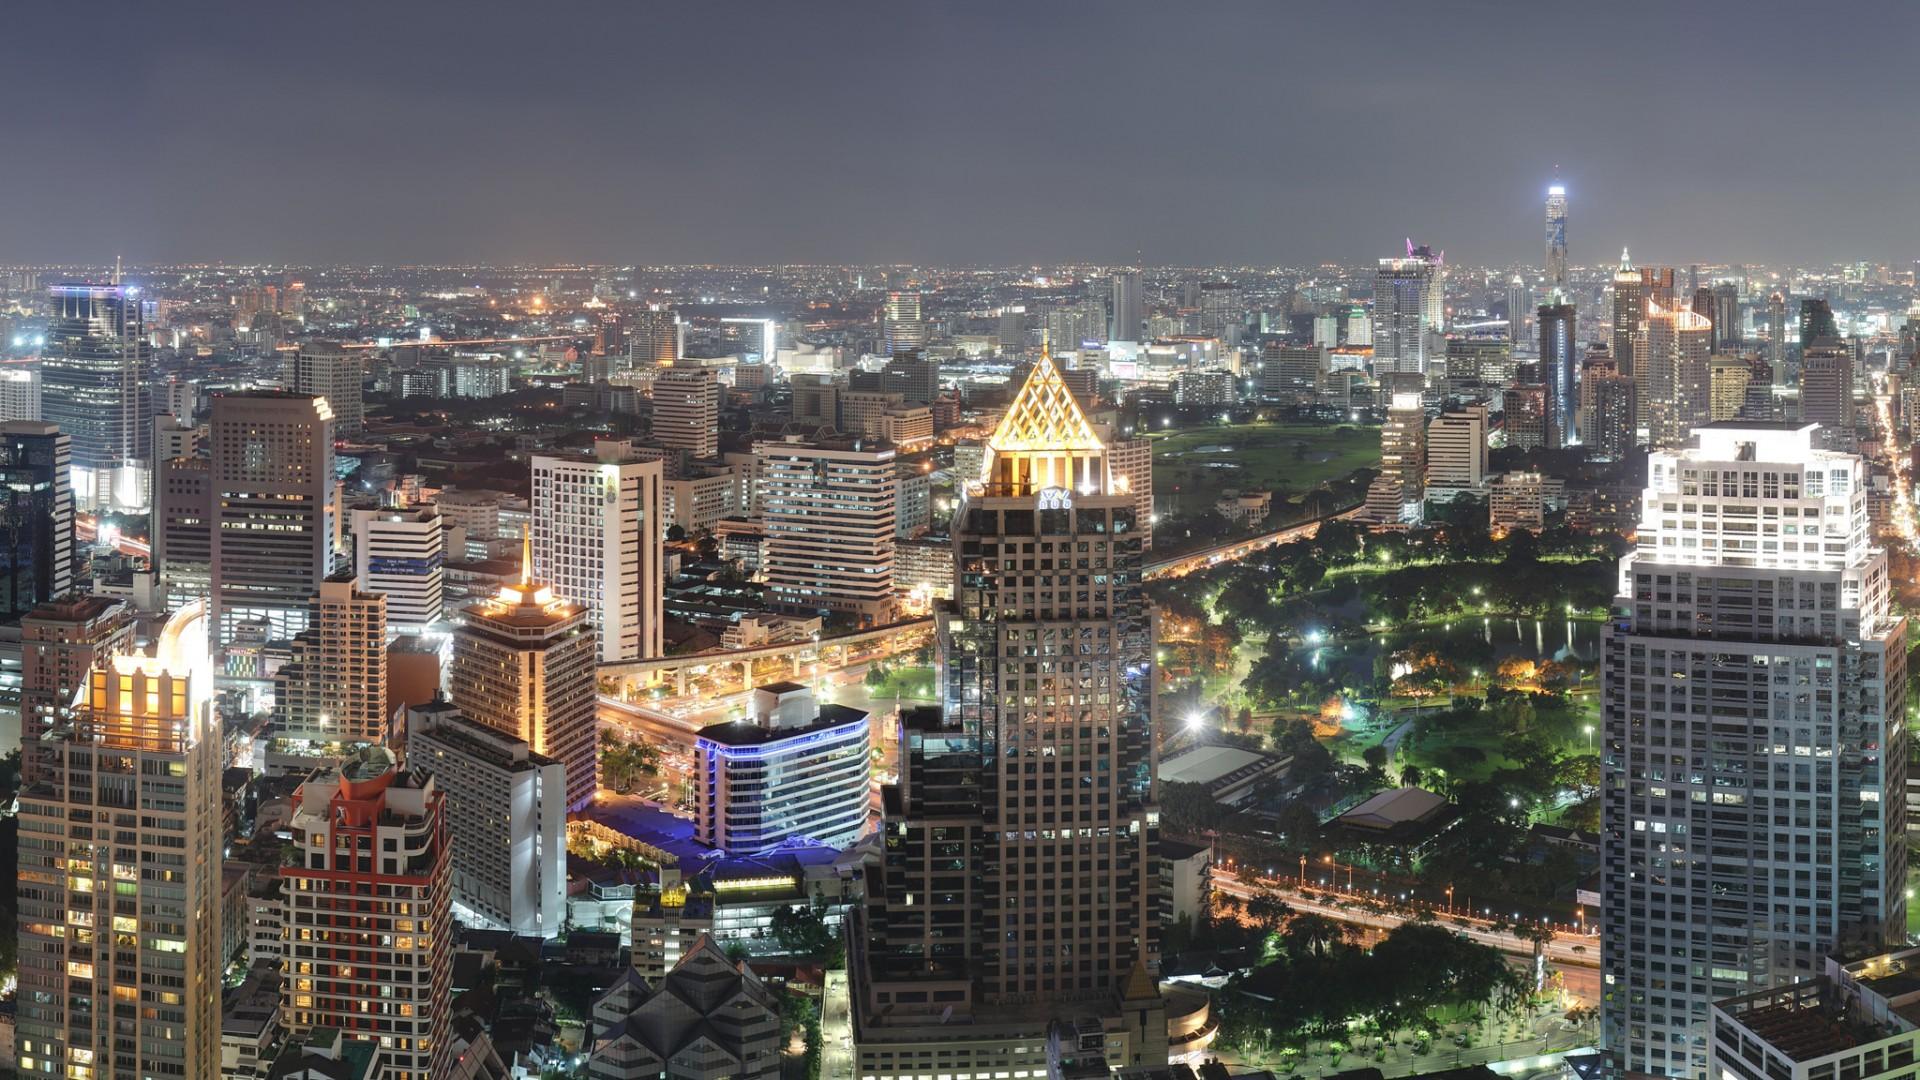 http://2.bp.blogspot.com/-nDxBr2W2J28/UDnjDeC-hAI/AAAAAAAAEBE/dMpaeX02QHE/s1920/bangkok-by-night1080.jpg